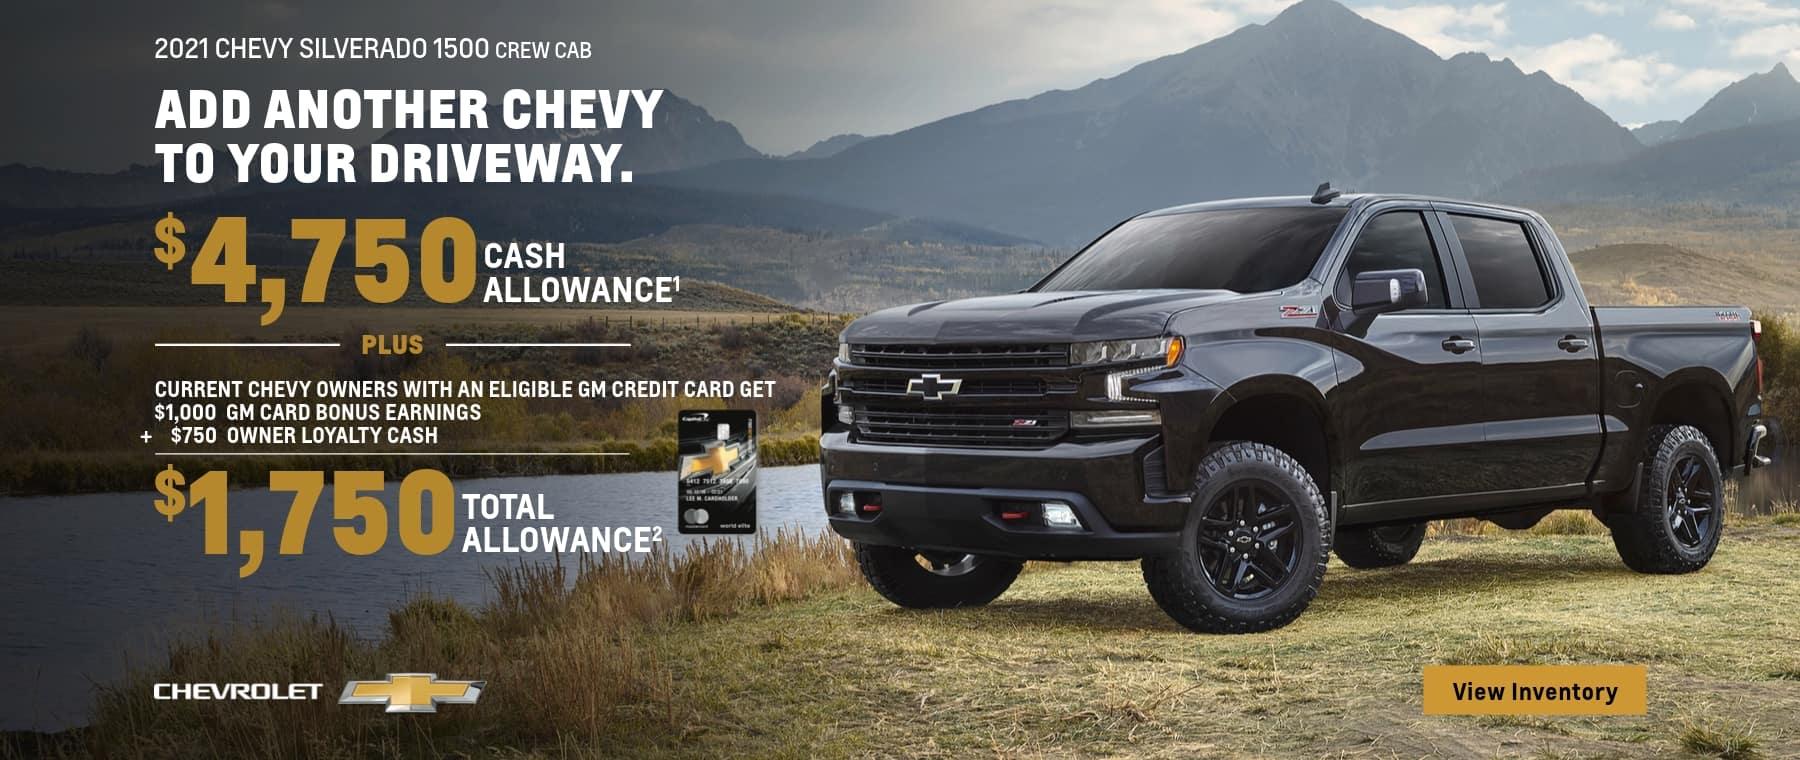 2021 Chevy Silverado 1500 Crew Cab $4,750 Cash allowance plus $1,750